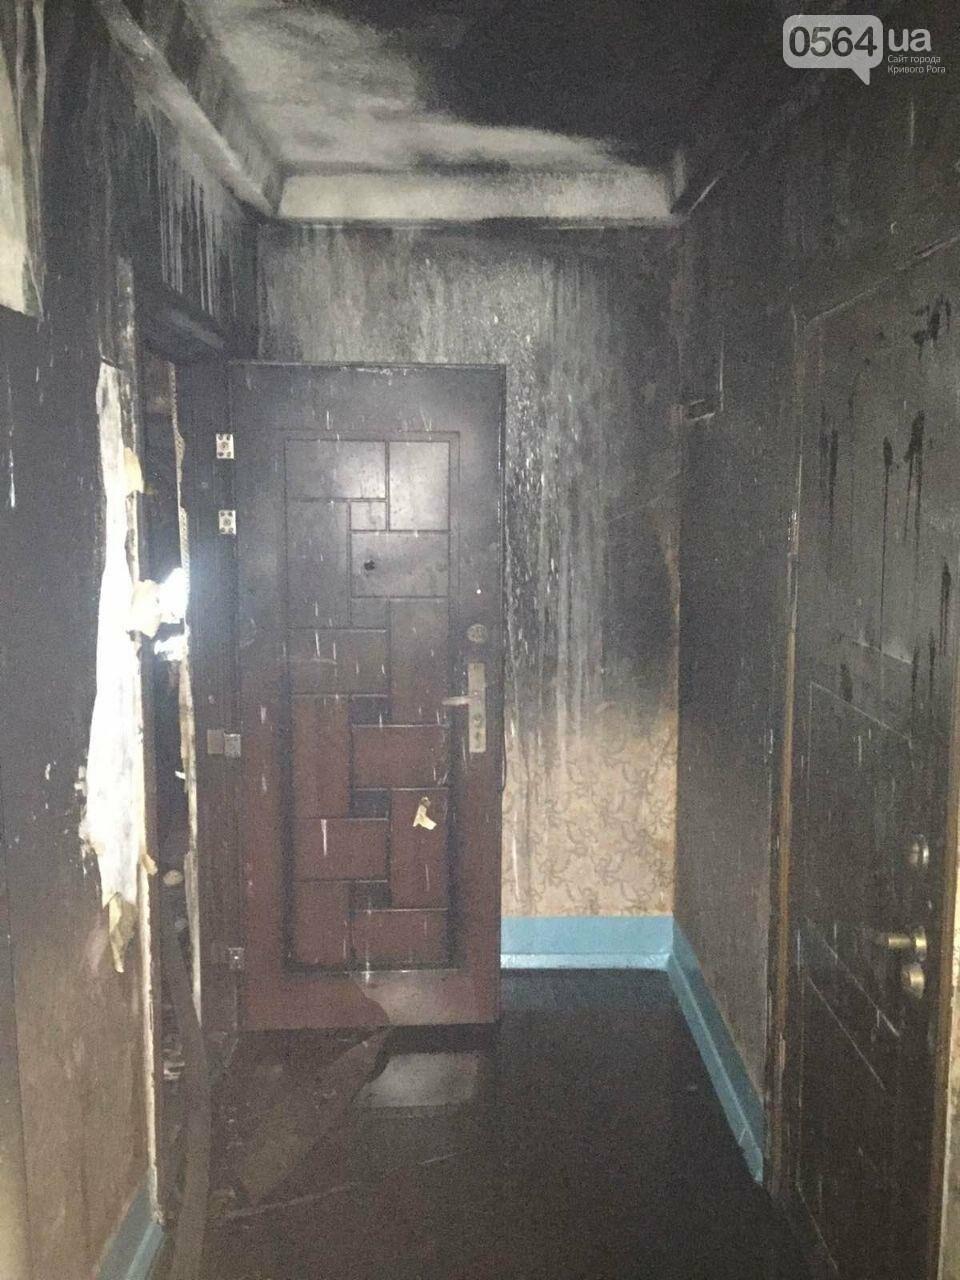 В Кривом Роге загорелась квартира на 6 этаже. Найдено тело мужчины, - ФОТО 18+, ВИДЕО, ОБНОВЛЕНО, фото-4